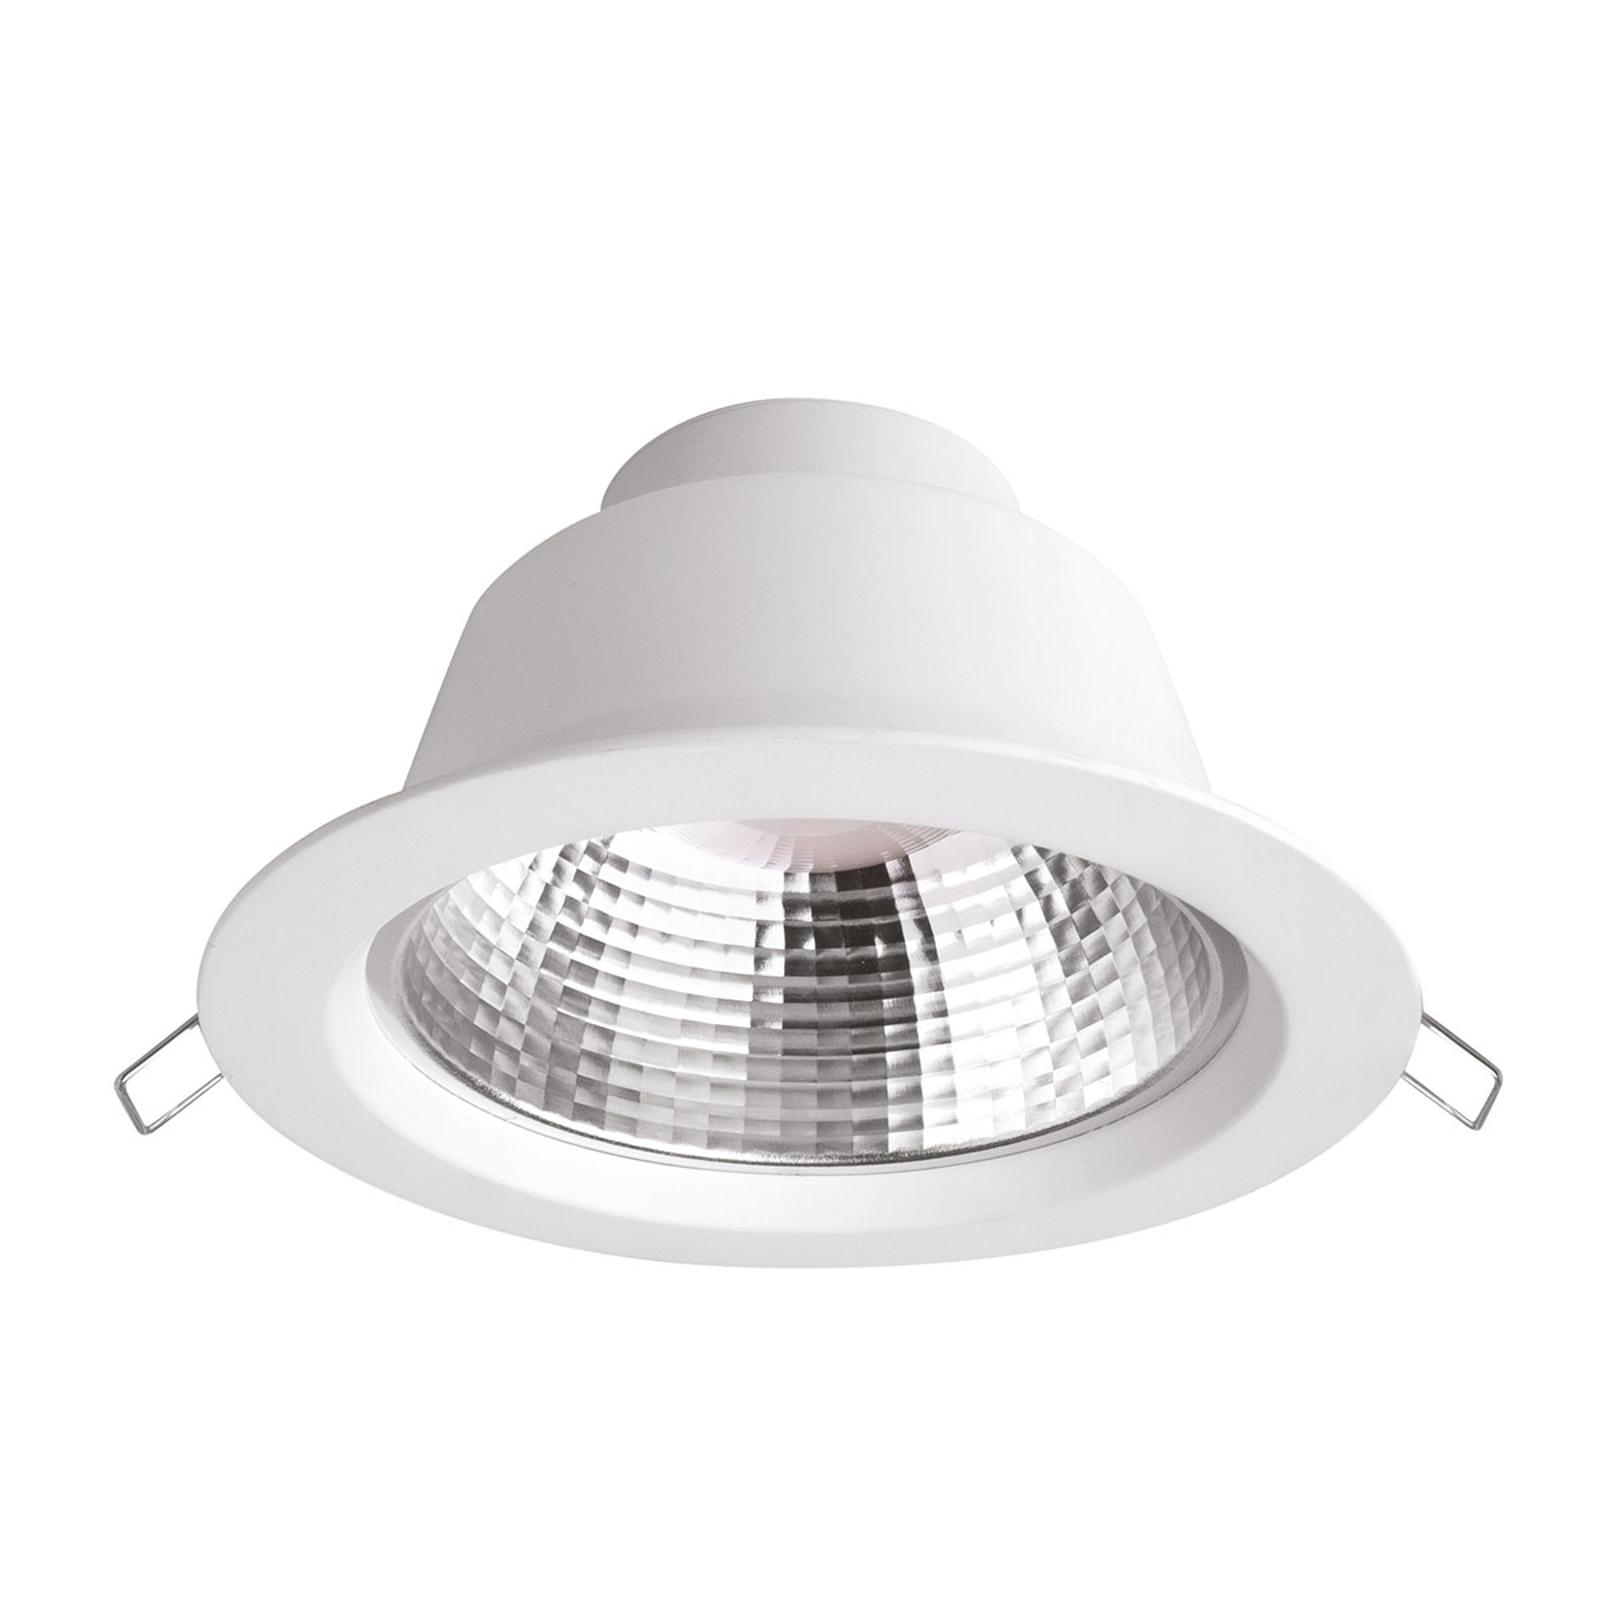 Faretto LED da incasso Siena, 9,5 W, 4.000 K